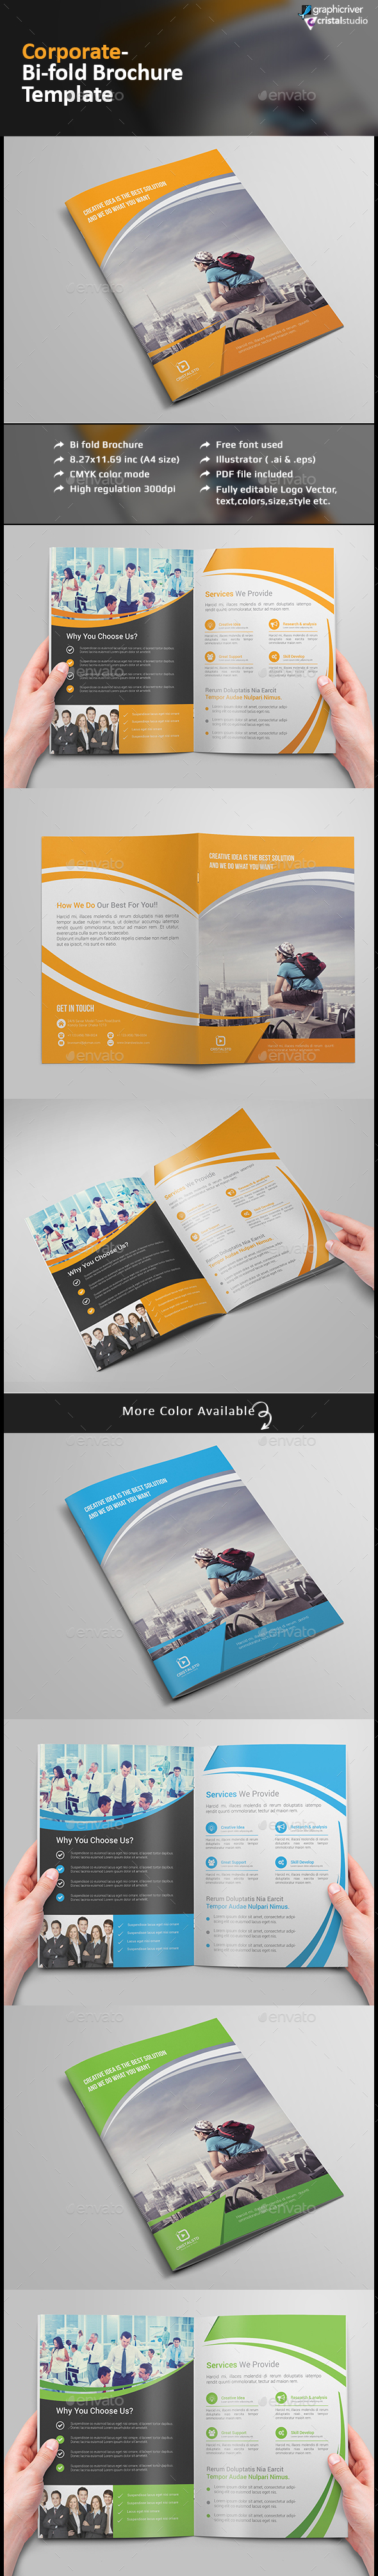 Bi-fold Brochure-Multipurpose - Corporate Brochures